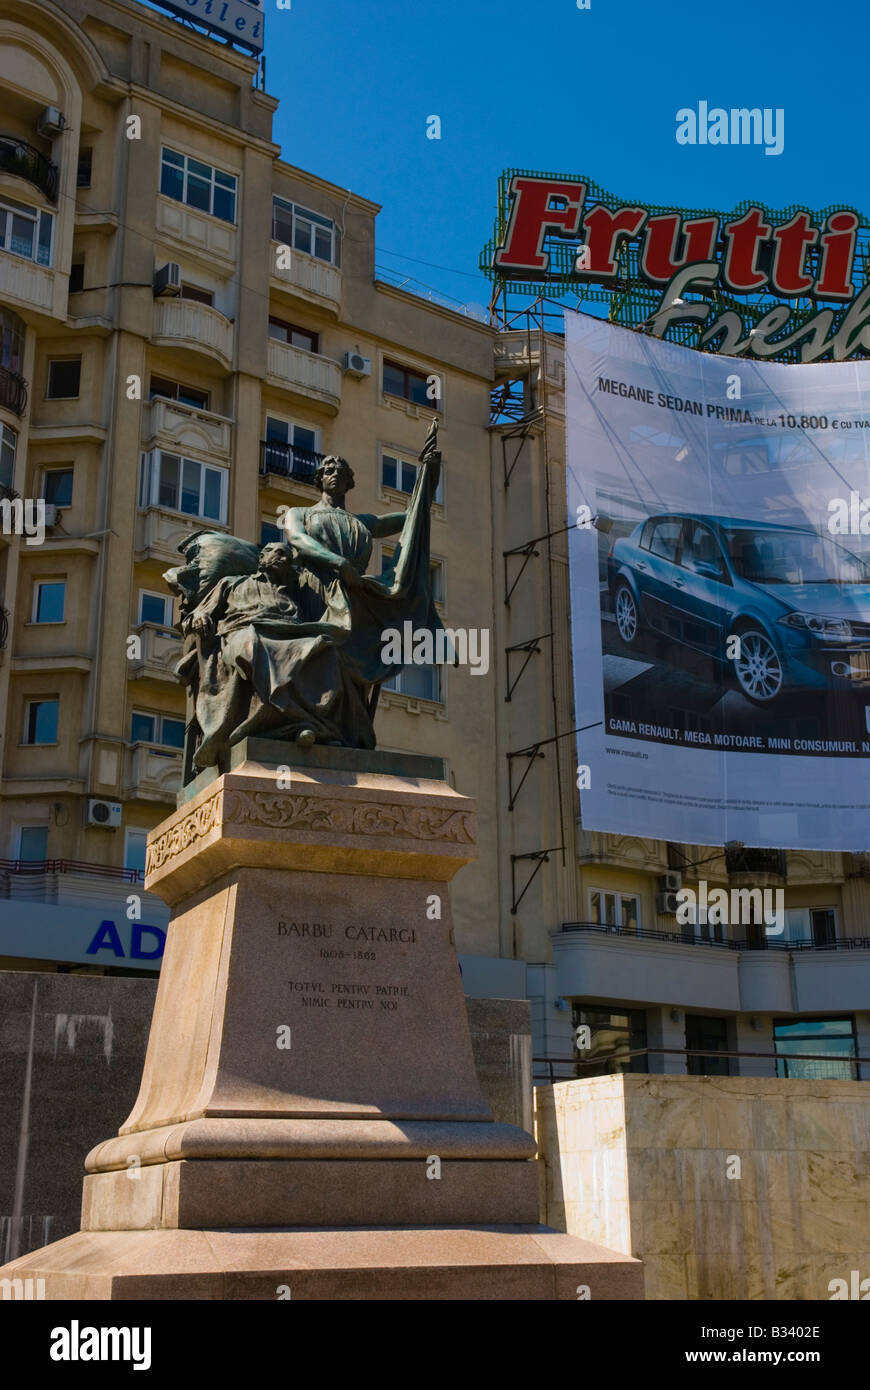 Statue de Barbu Catargi à Piata Unirii Bucarest en Roumanie Europe Photo Stock